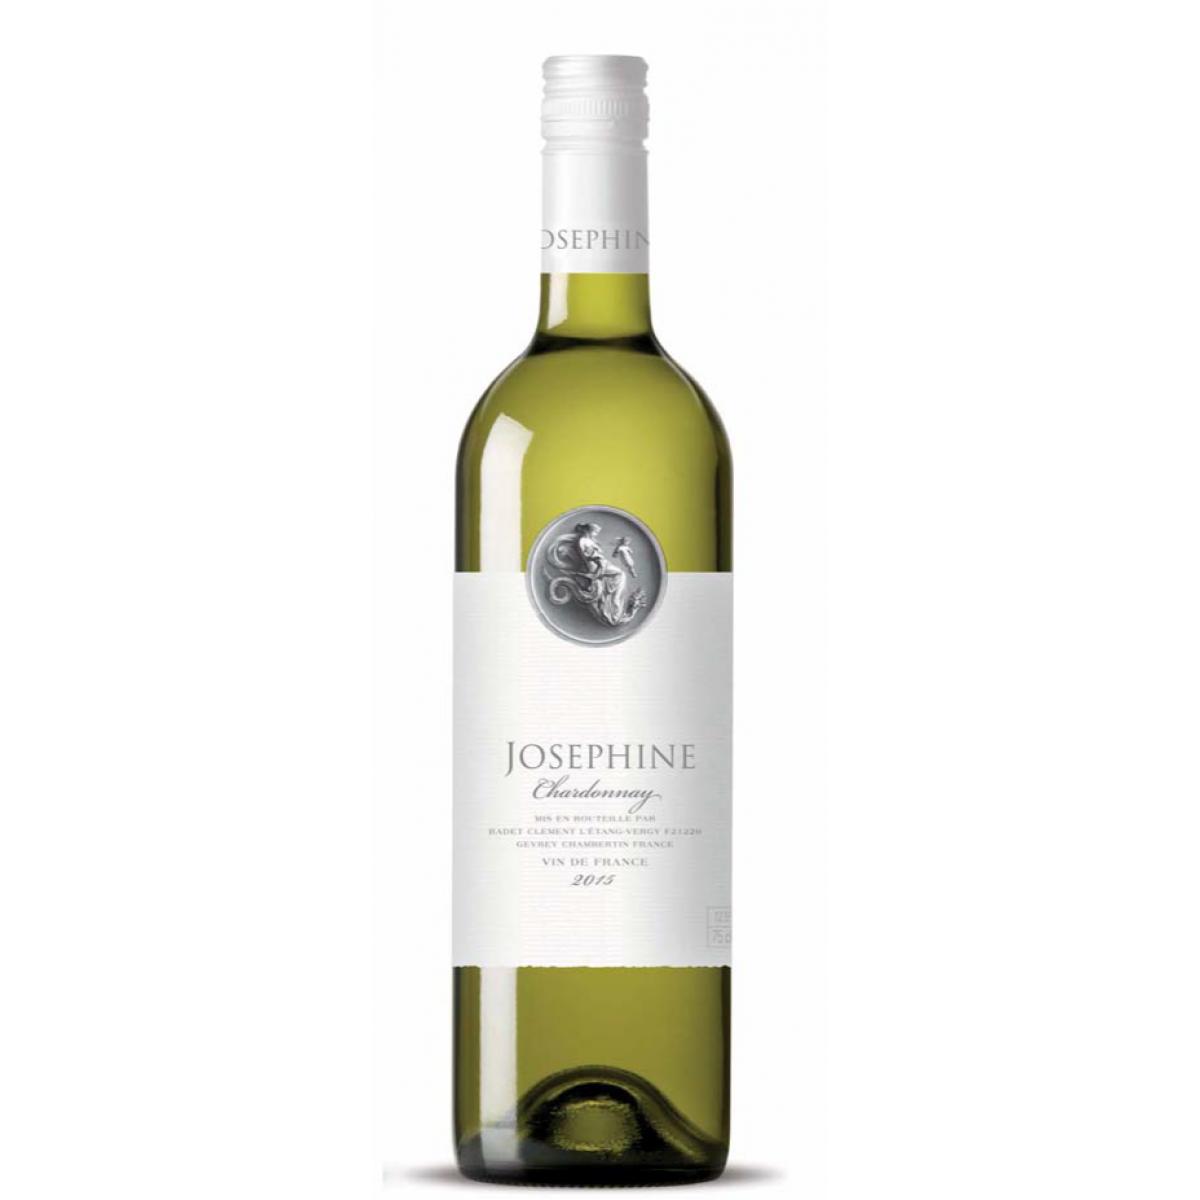 Josephine Vin de France Chardonnay